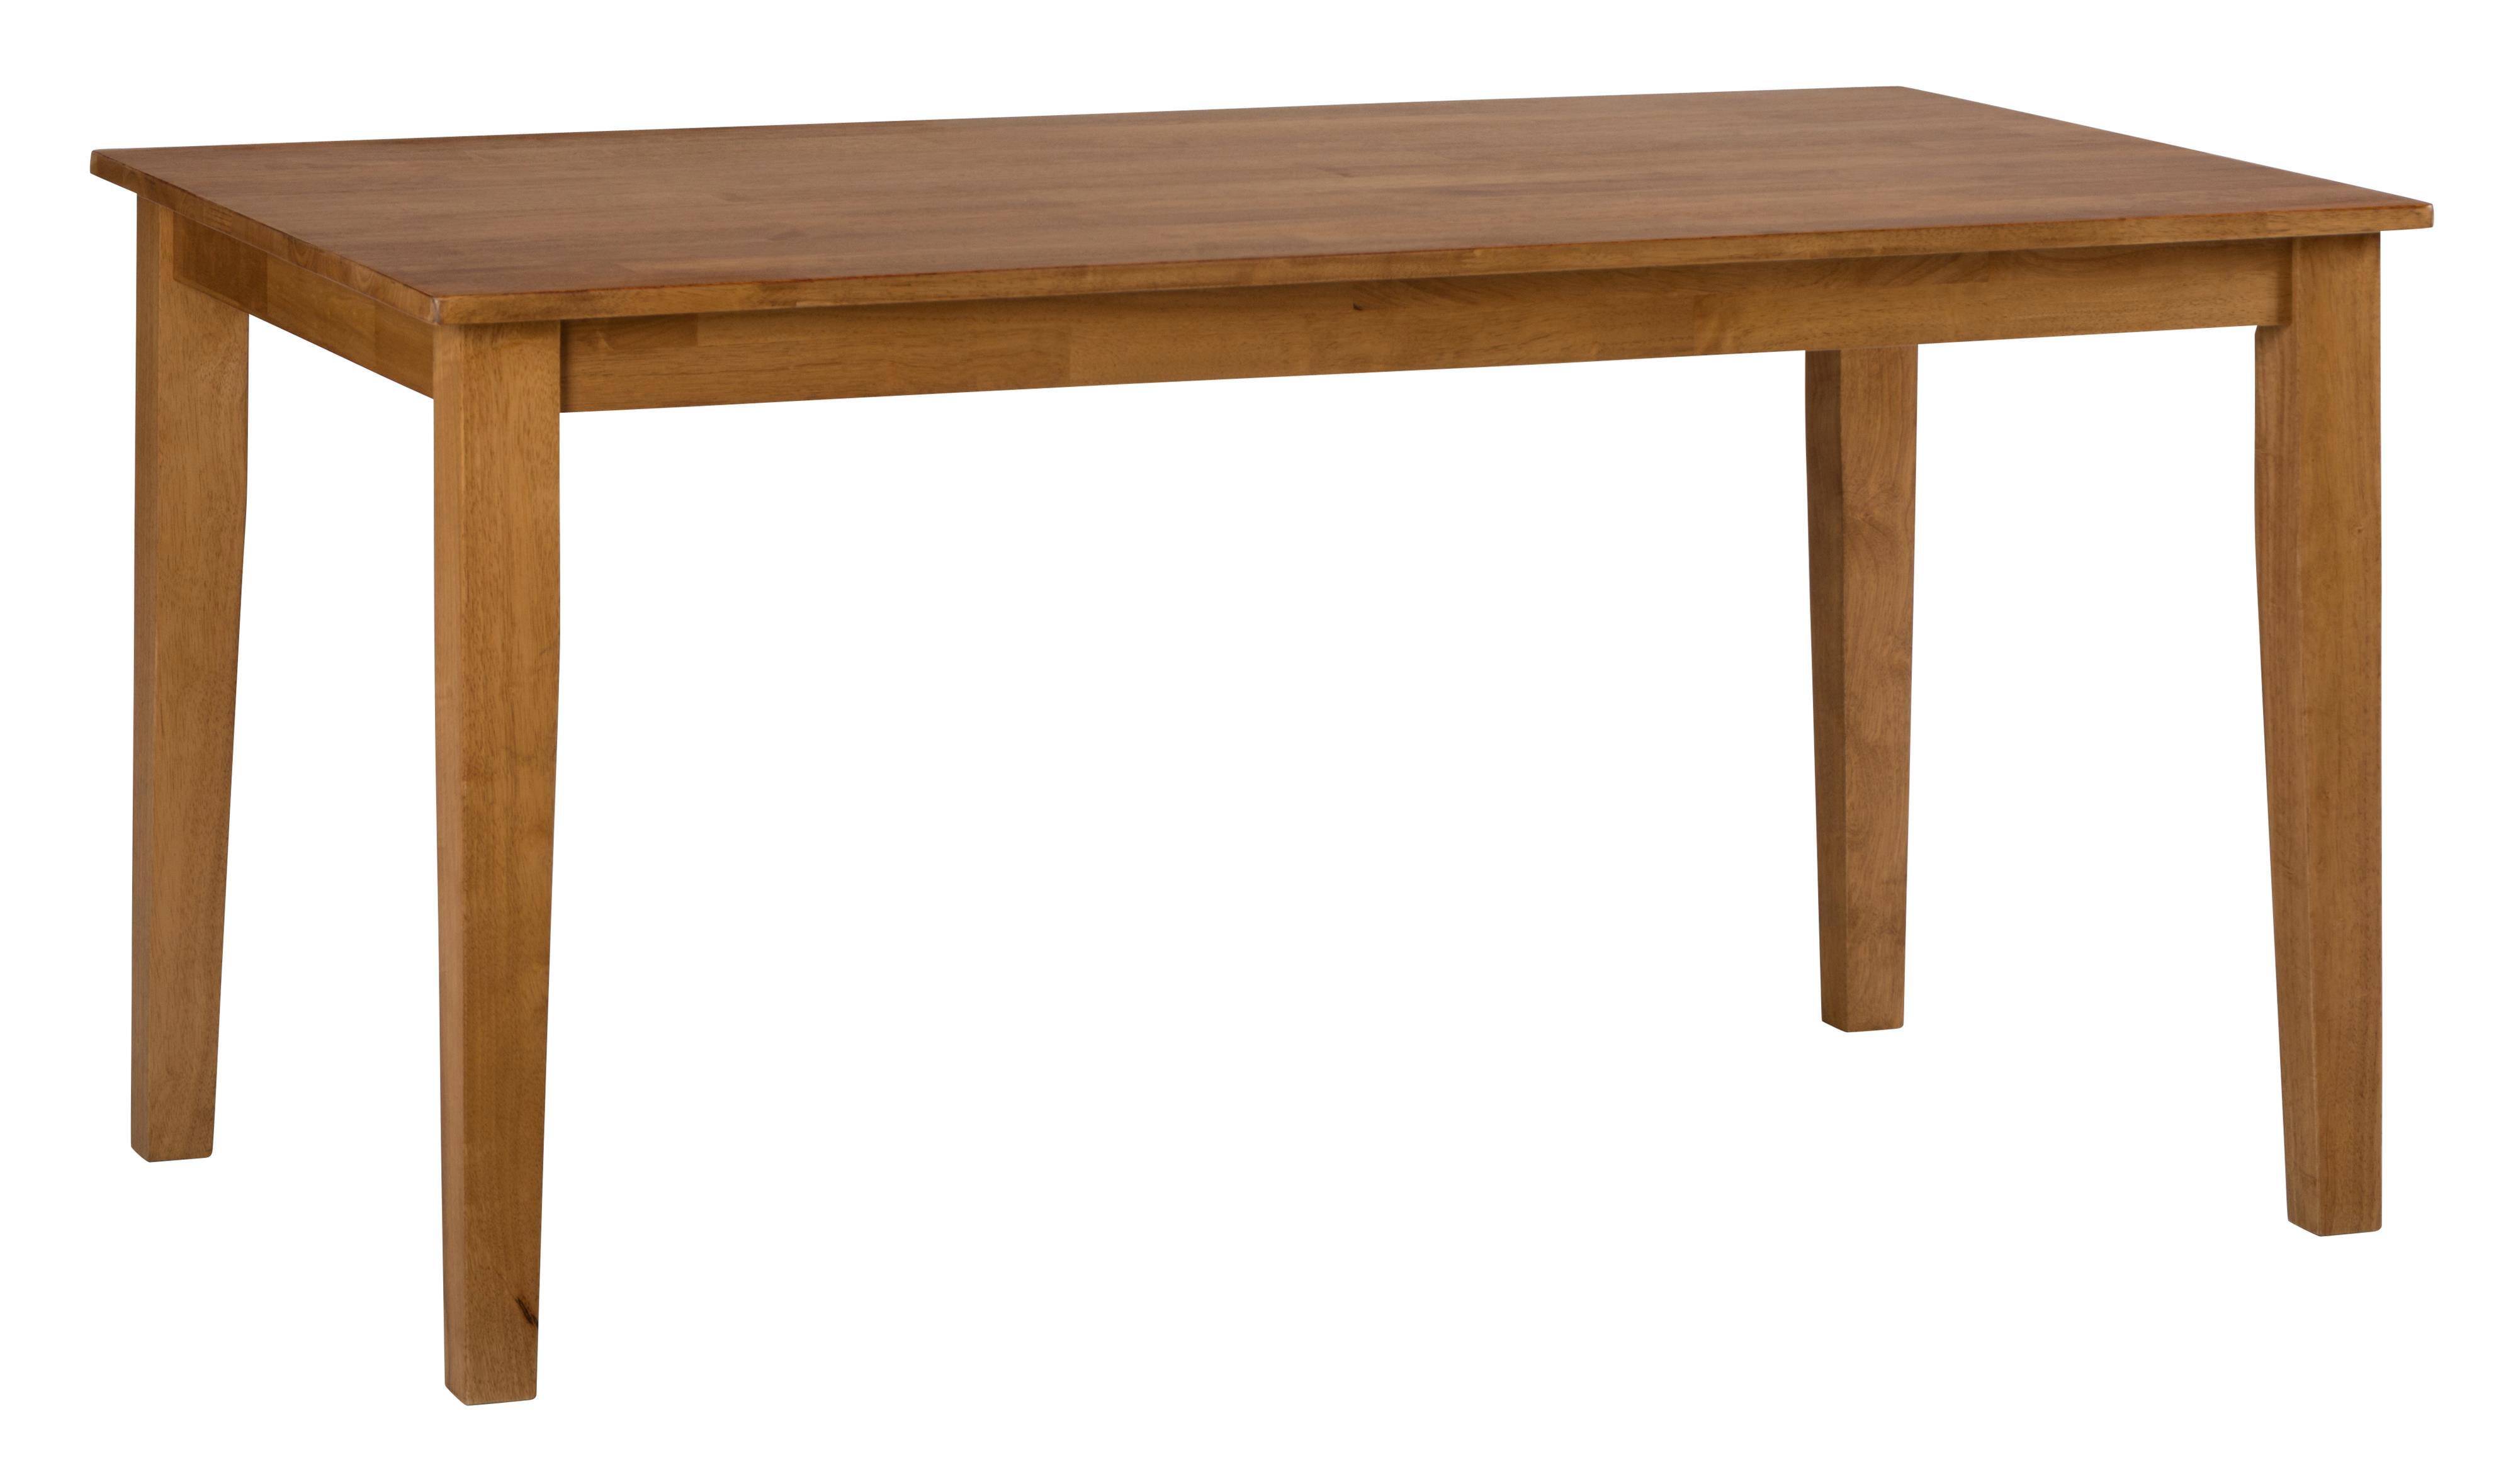 Jofran 352-60 Simplicity Honey Rectangle Dining Table by Jofran